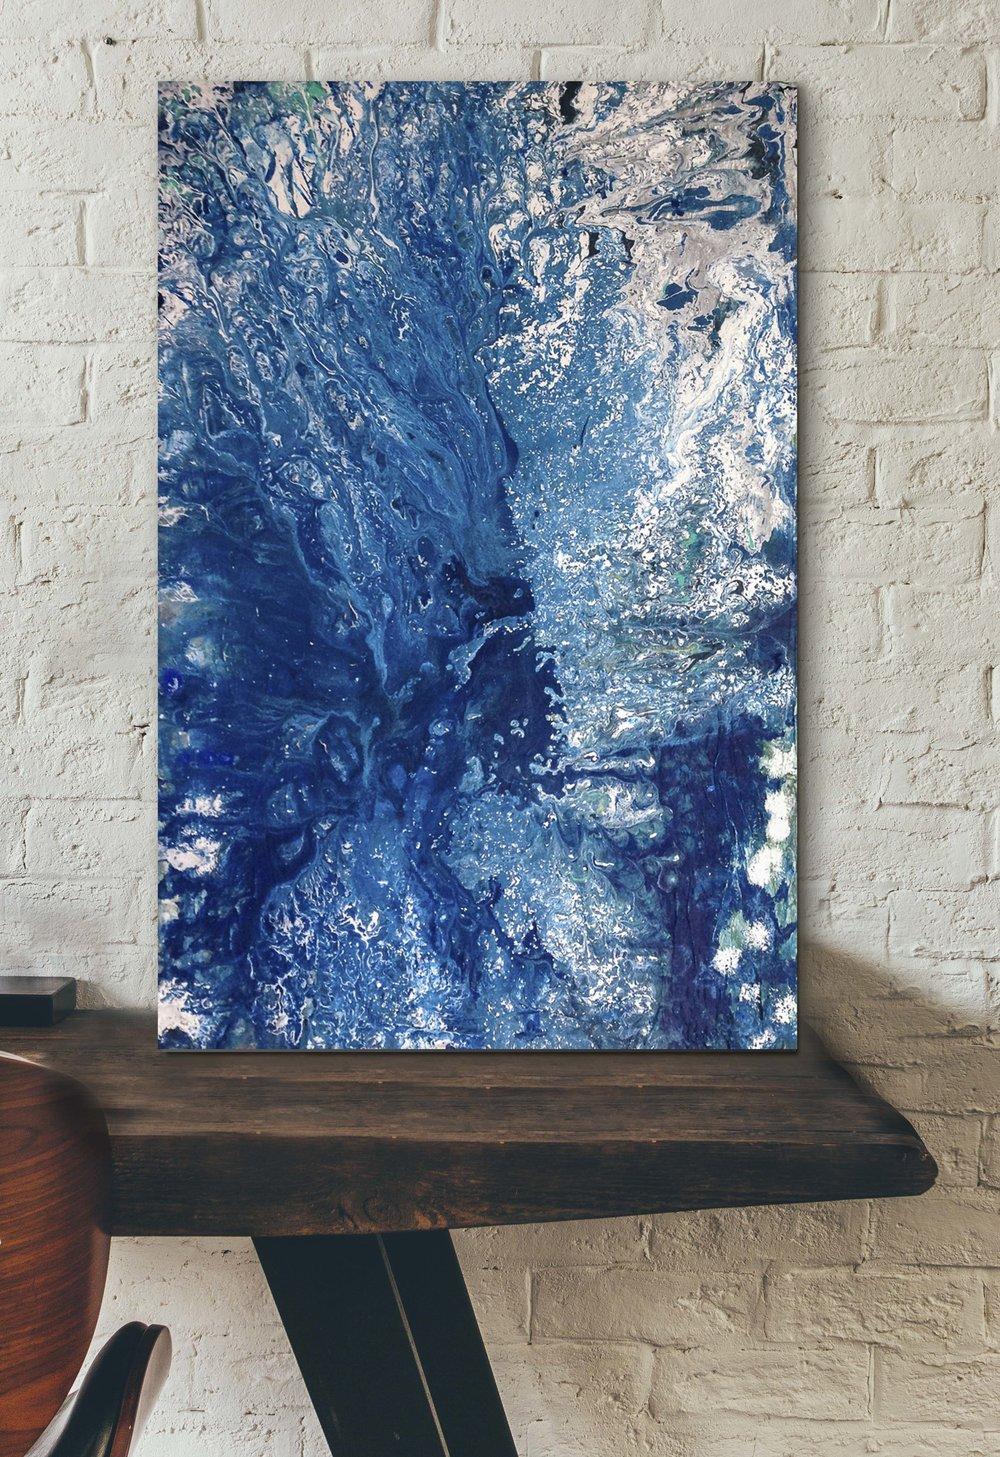 "Third Eye |  Acrylic and mixed media on canvas | 16x24"" | 2016"